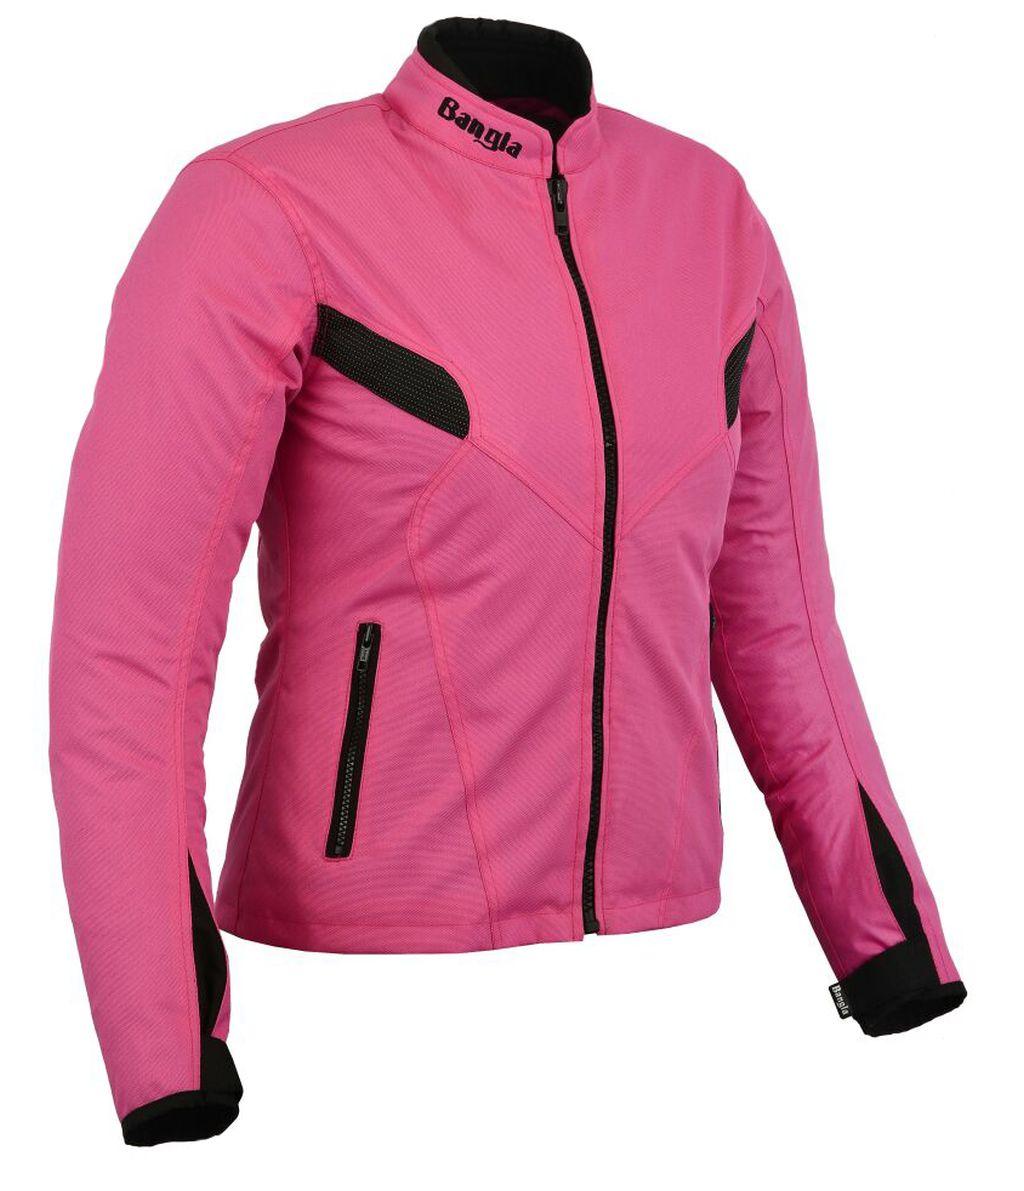 Bangla Damen Motorrad Jacke Motorracke Textil Pink schwarz S - XXXL